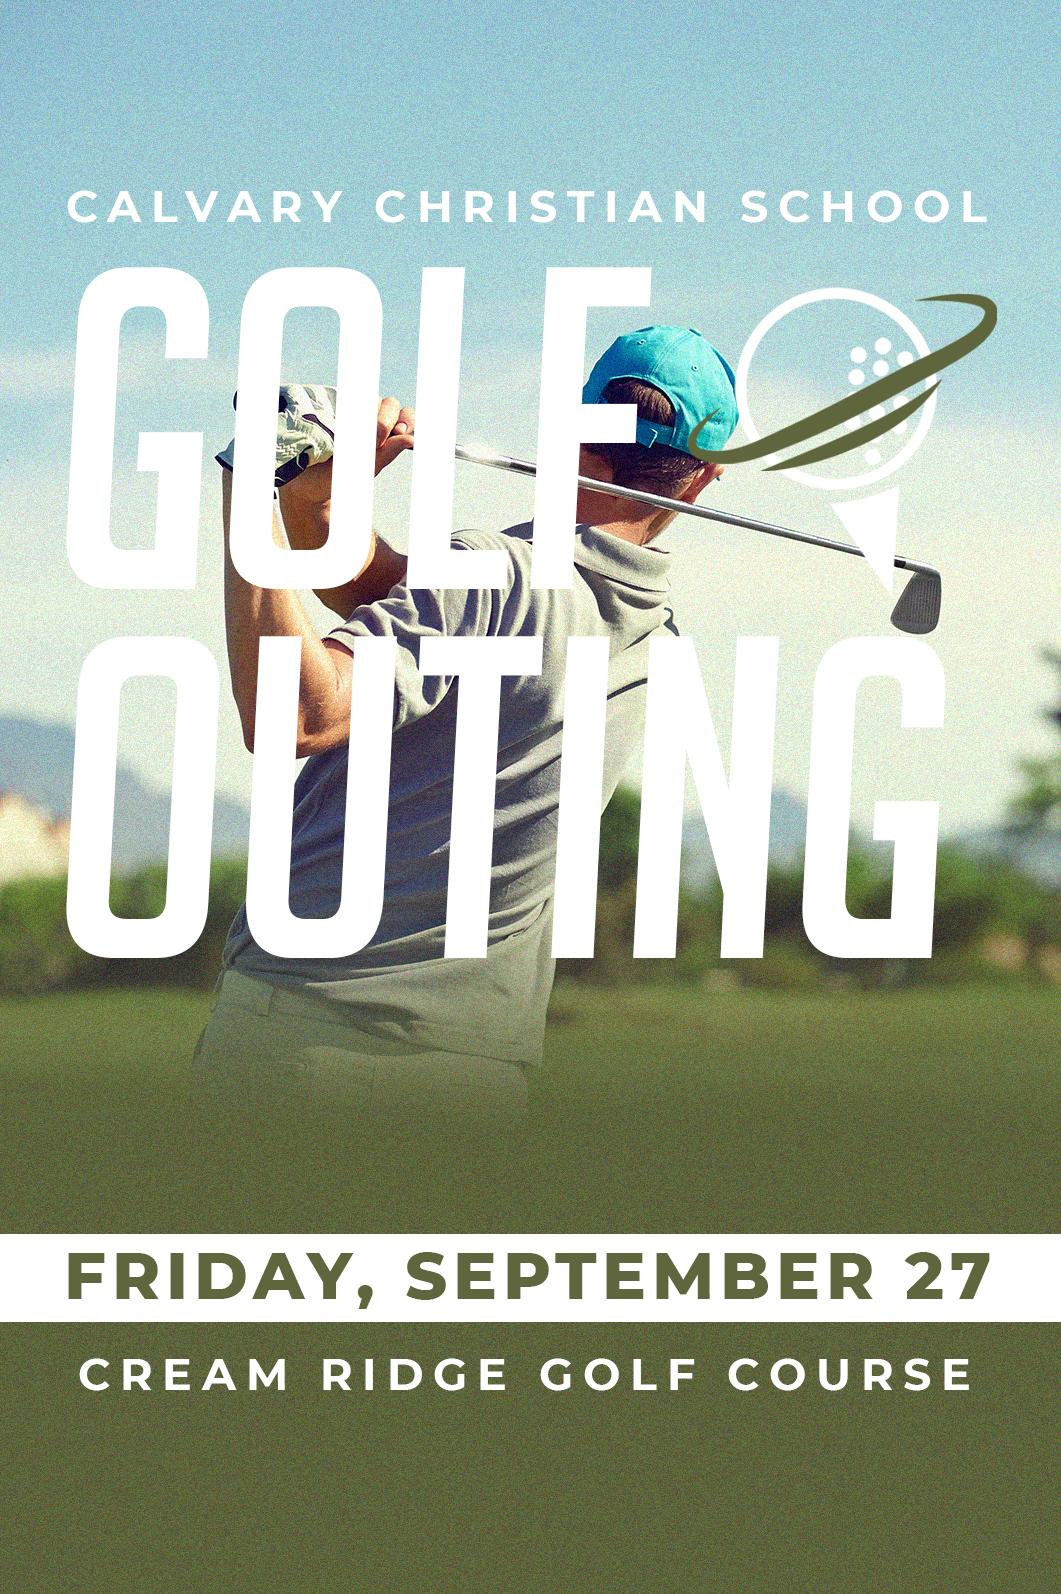 CCS_Golf Outing August 2019.jpg